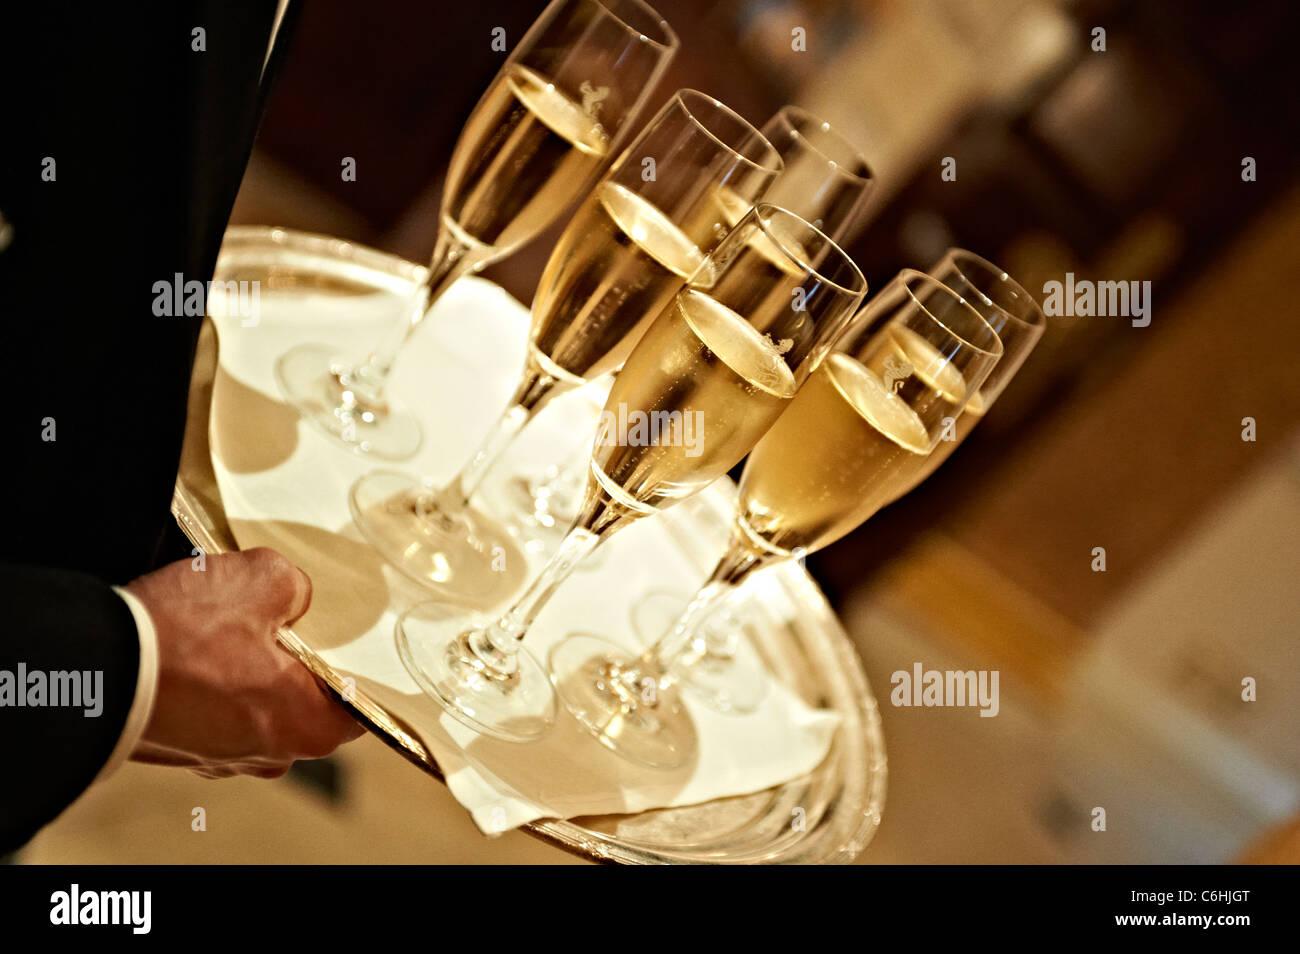 drinks - Stock Image